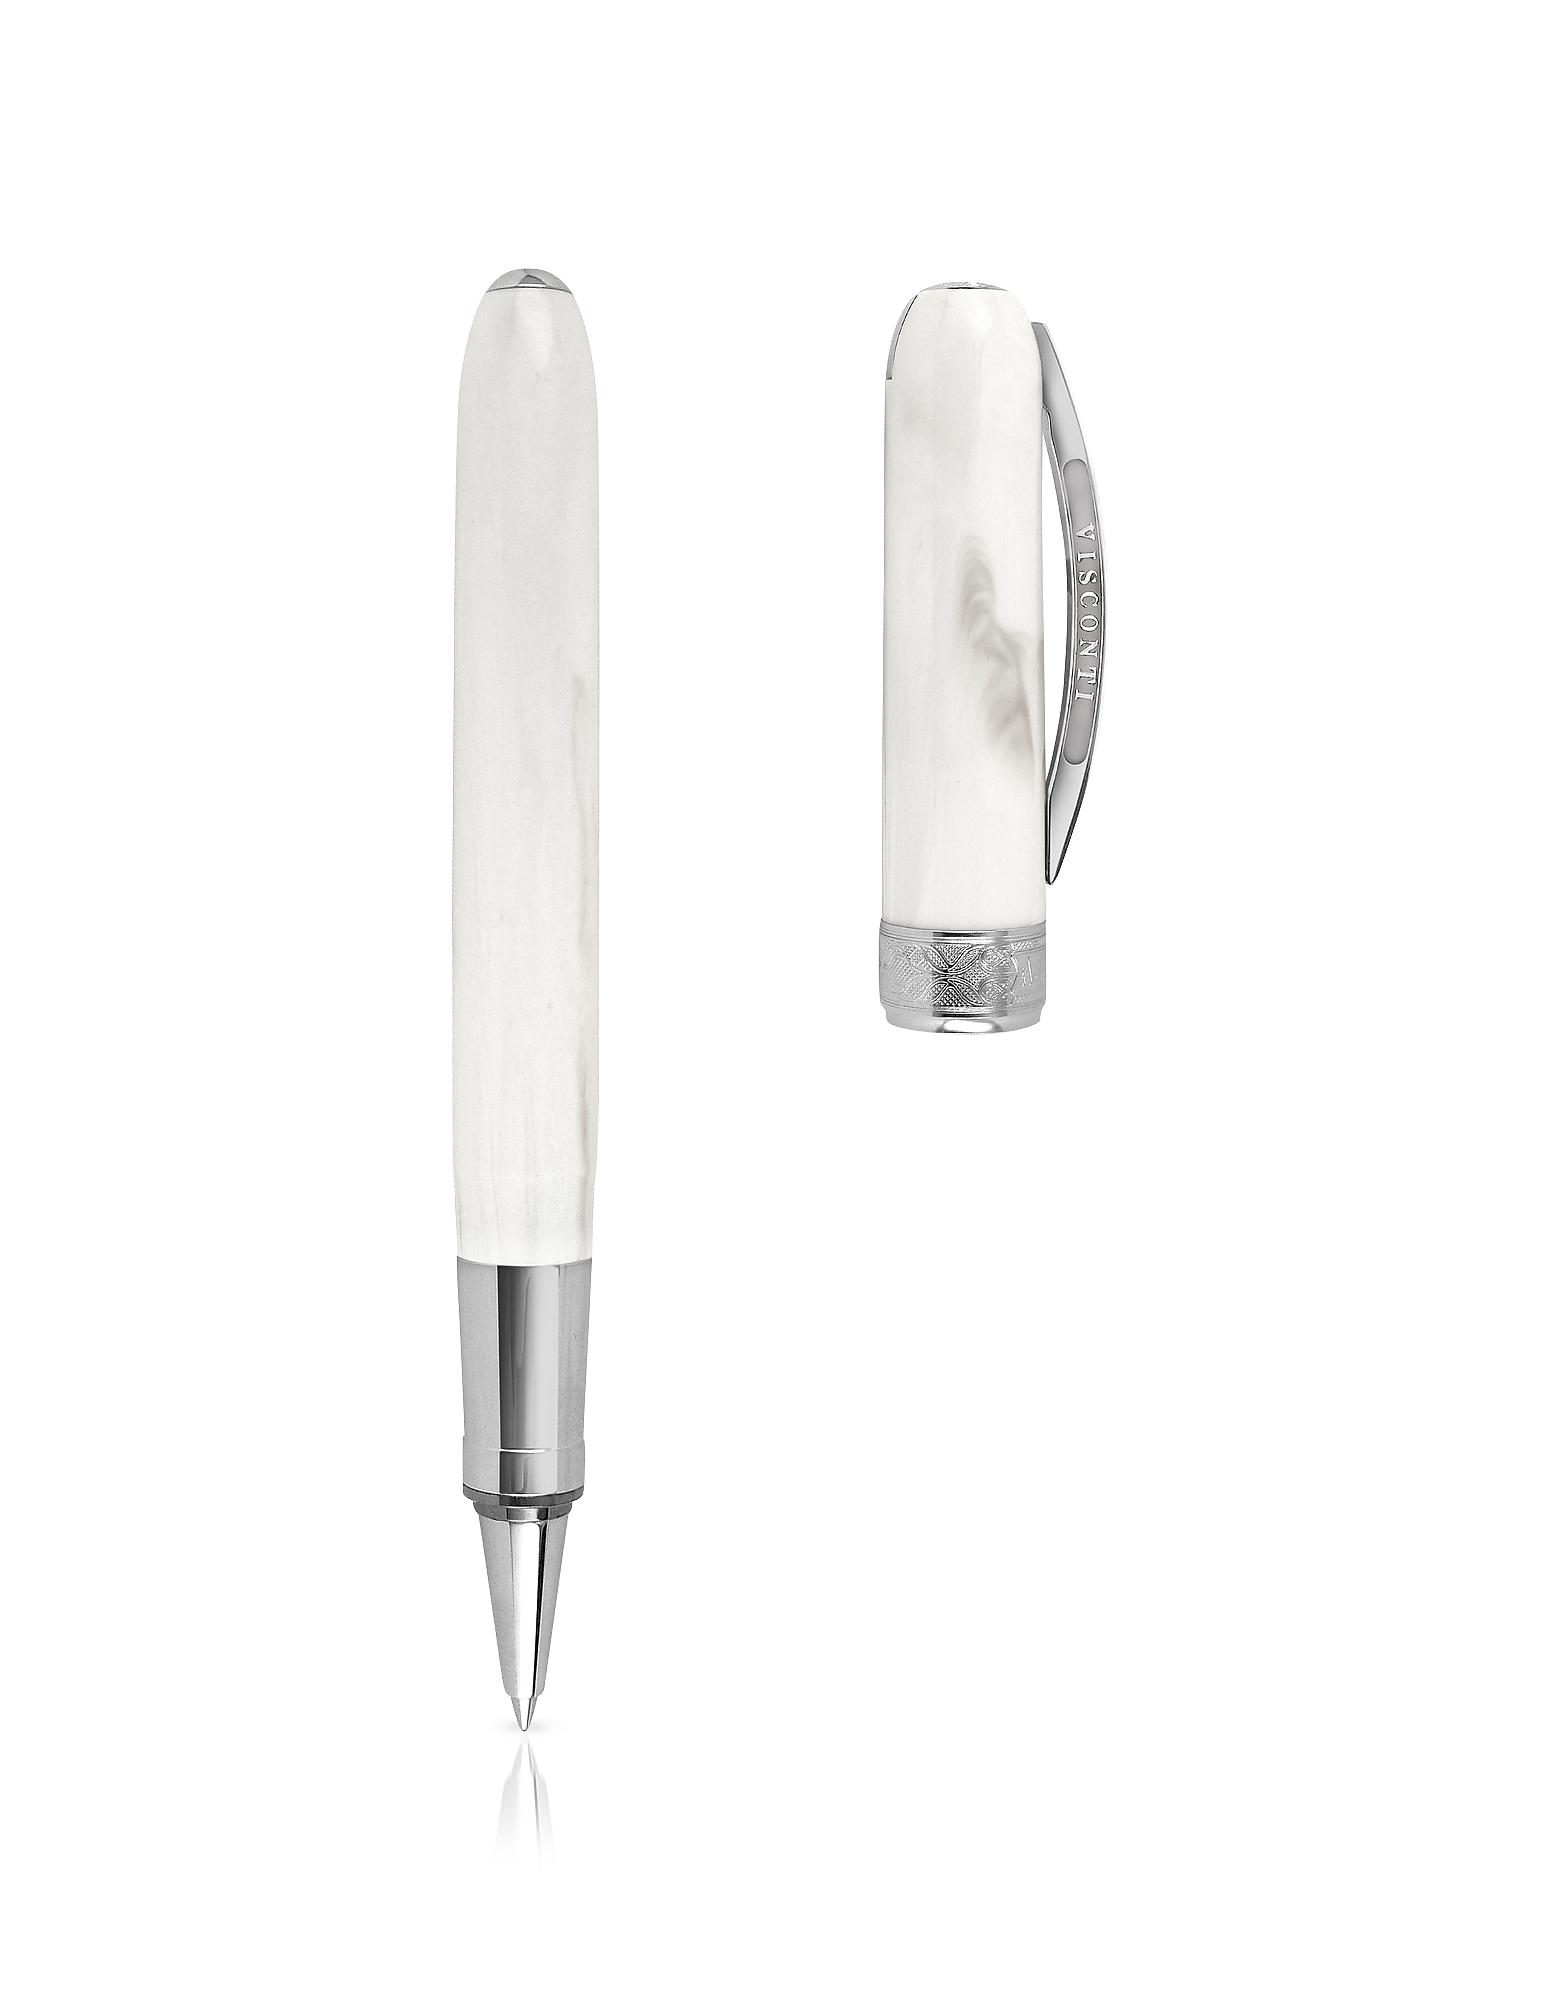 Visconti Writing Instruments, Rembrandt - Resin Ballpoint Pen